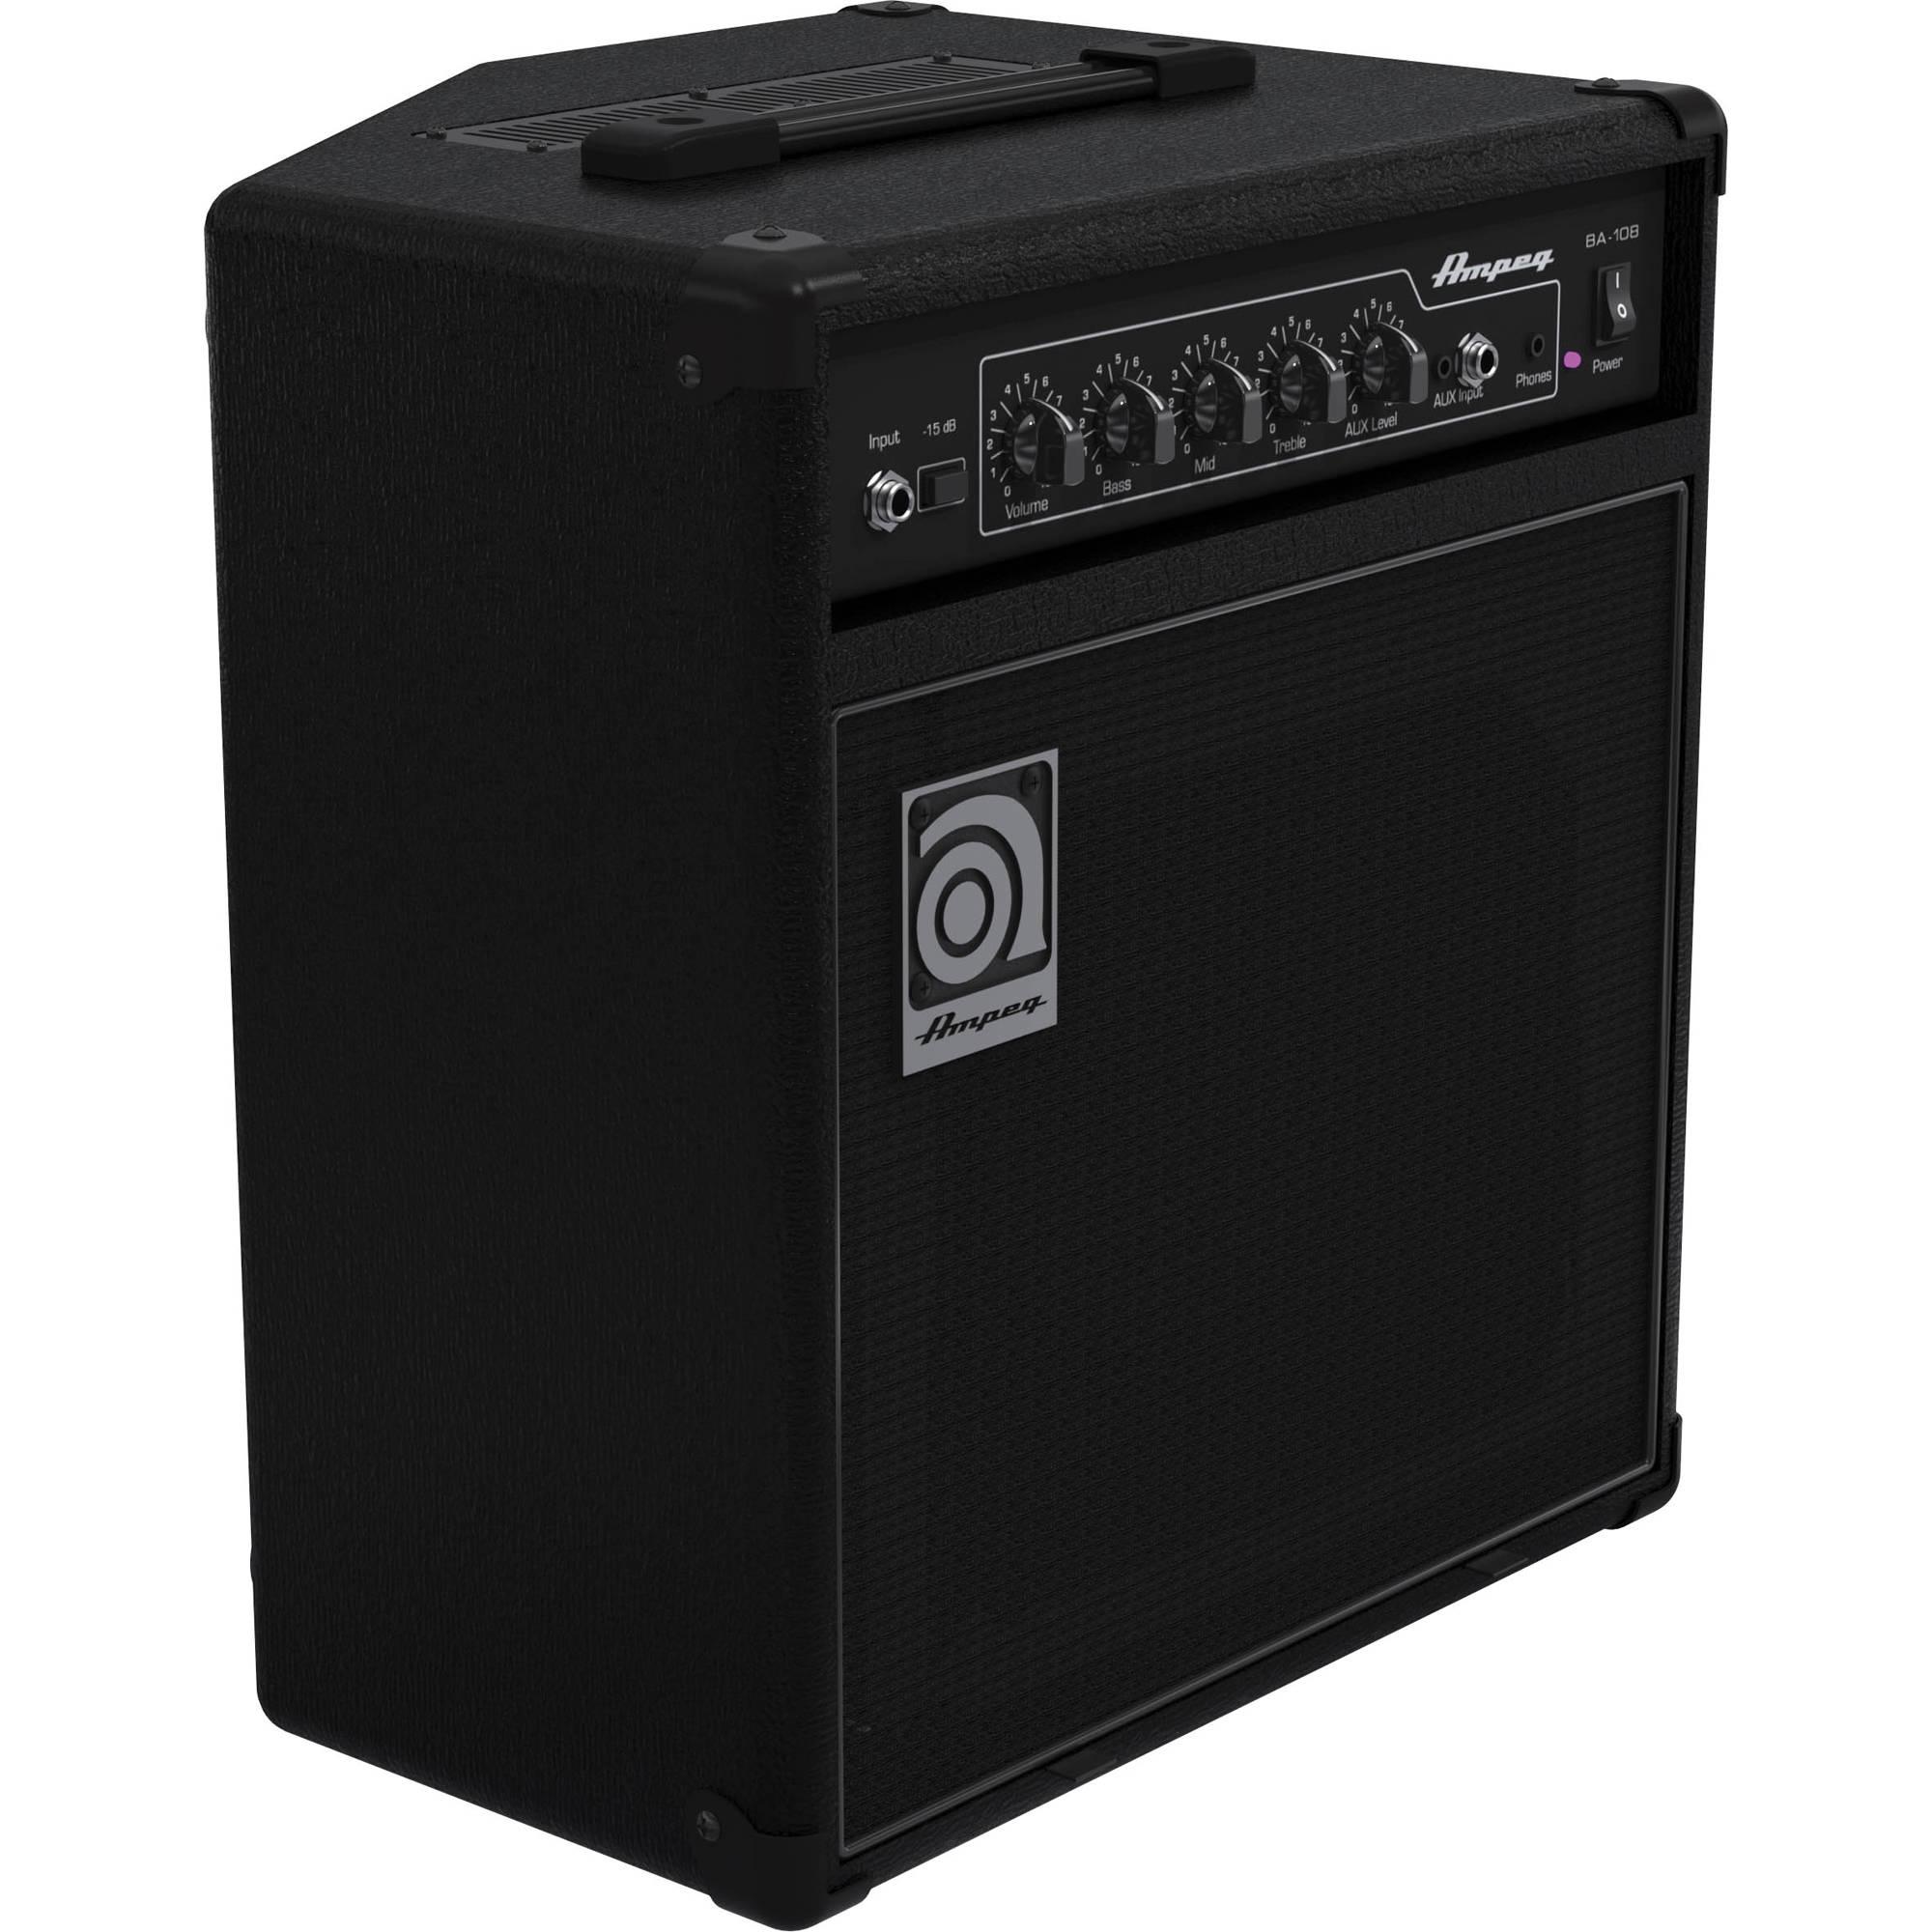 Combo Bass Amplifiers : ampeg ba 108v2 1x8 combo bass amp ba 108v2 b h photo video ~ Vivirlamusica.com Haus und Dekorationen